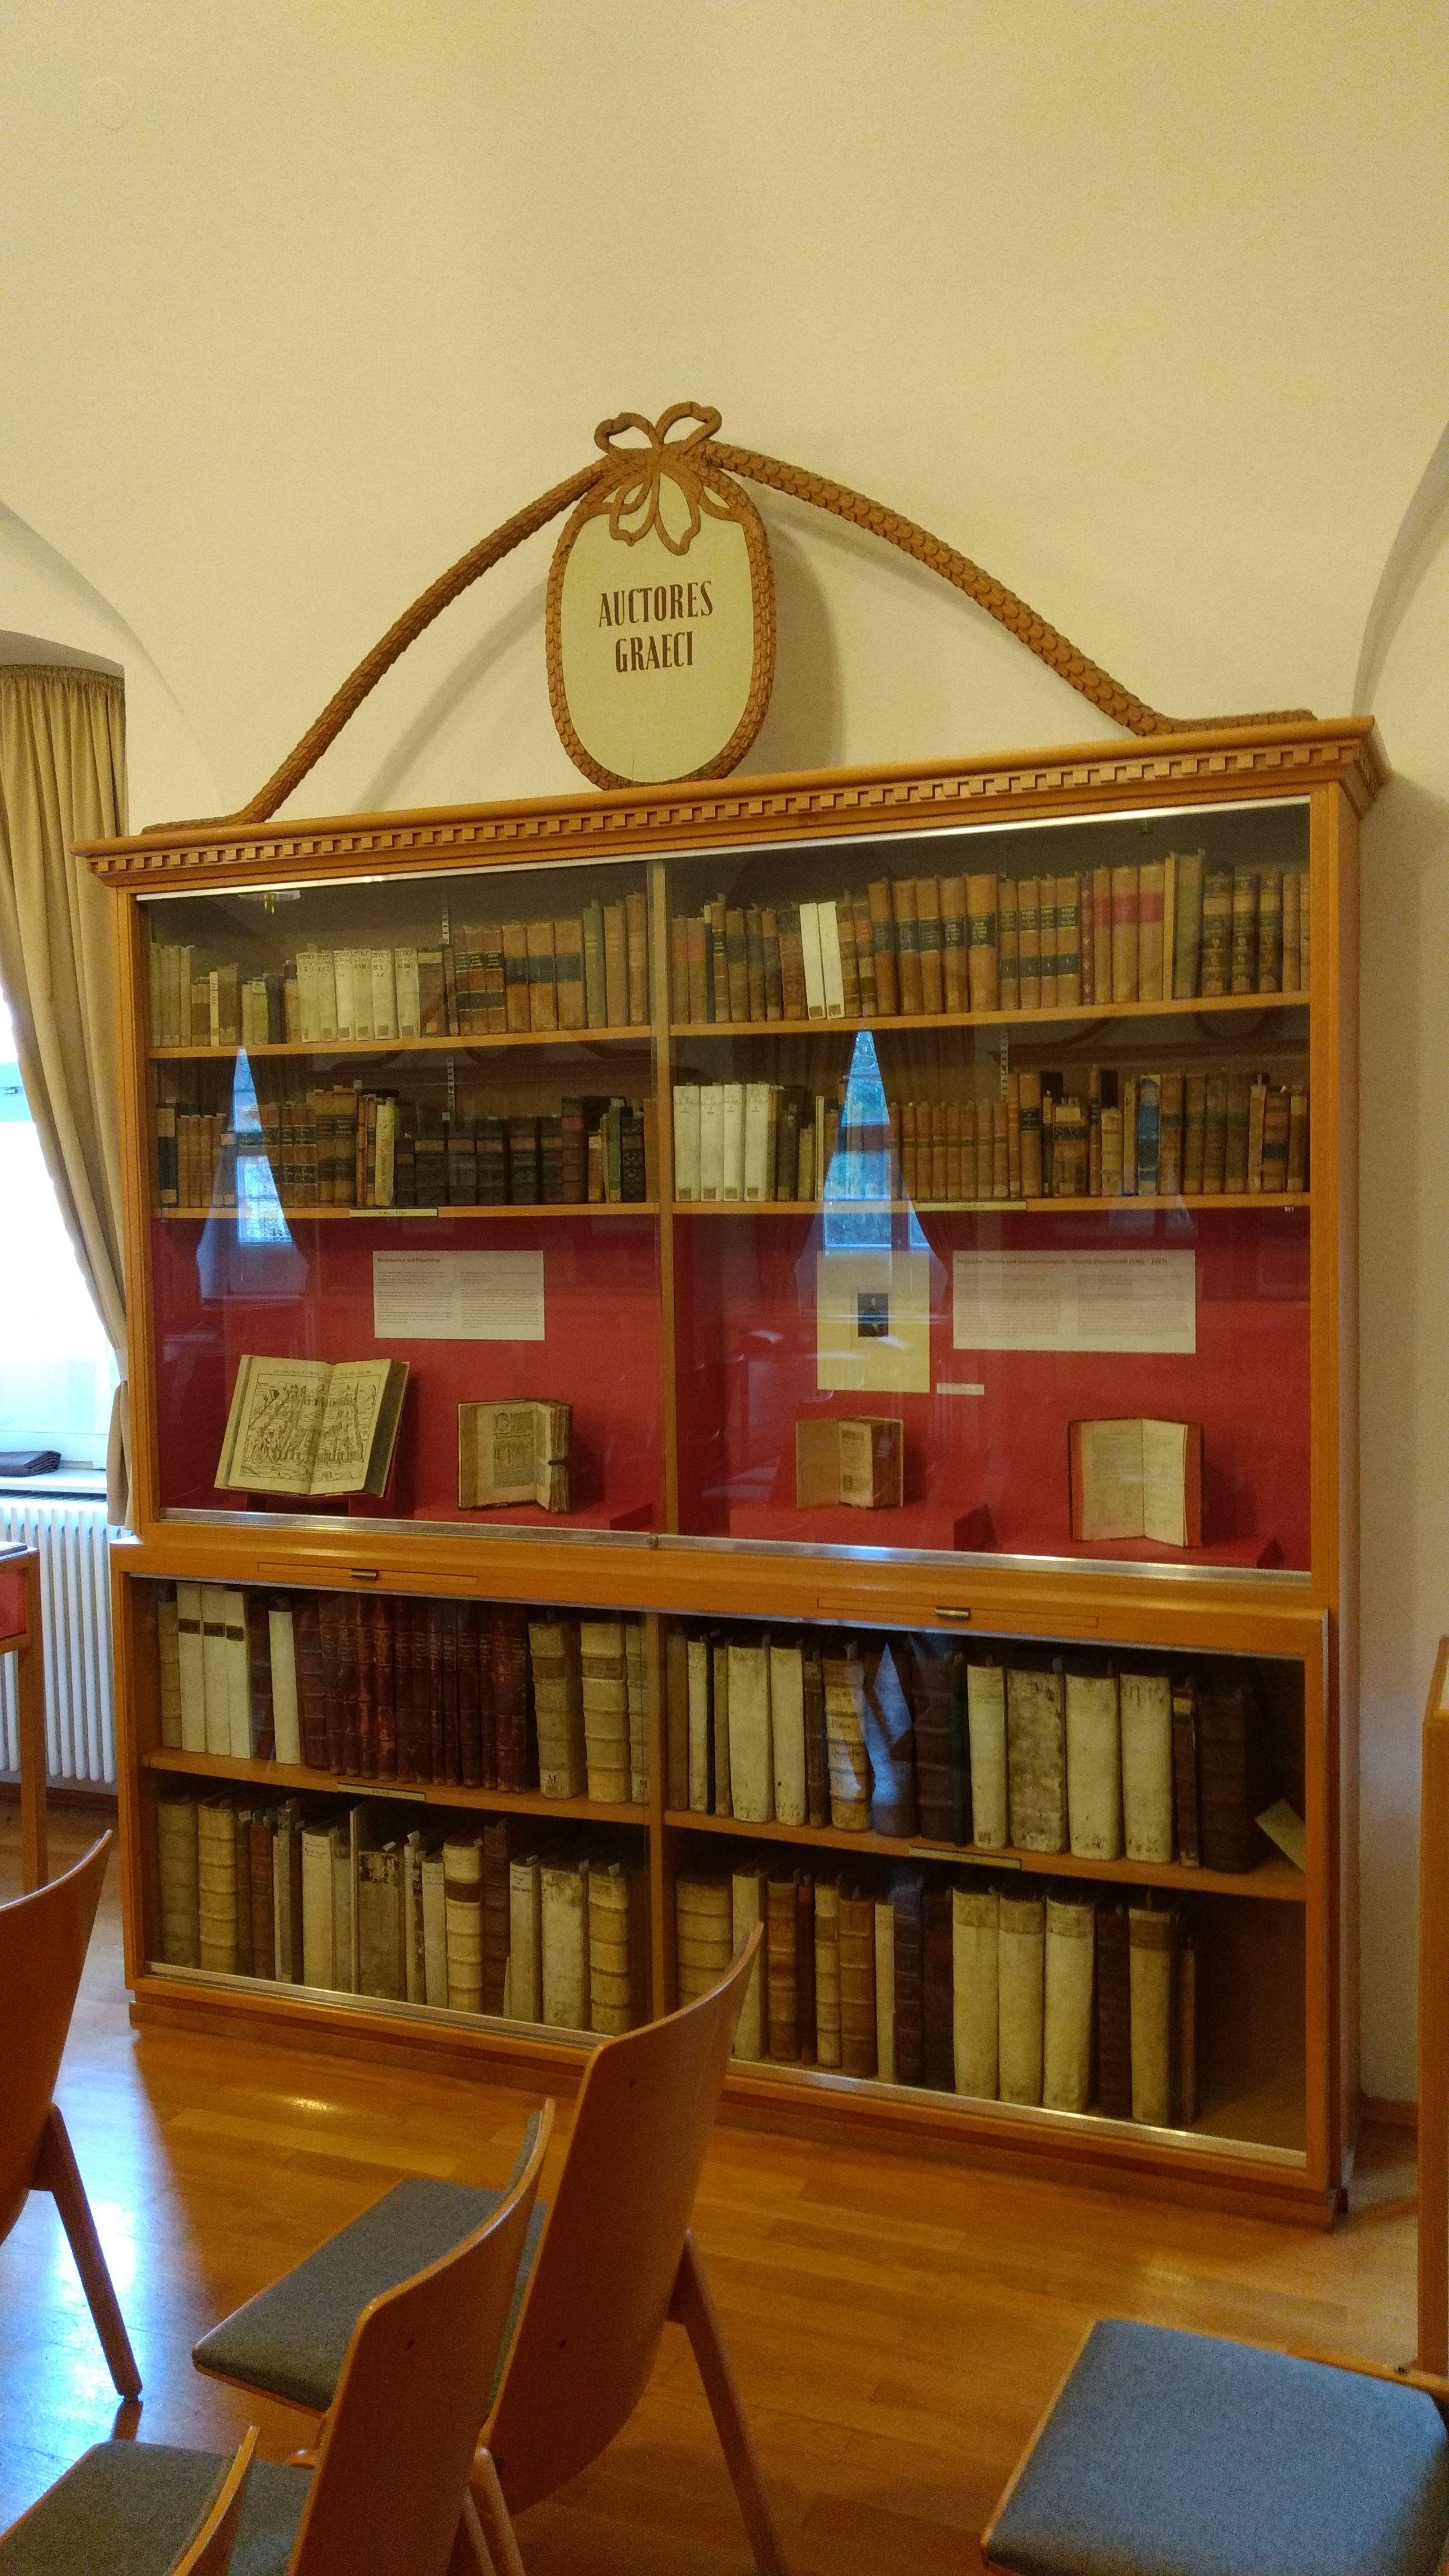 Historische Bibliothek Rastatt 6.jpg